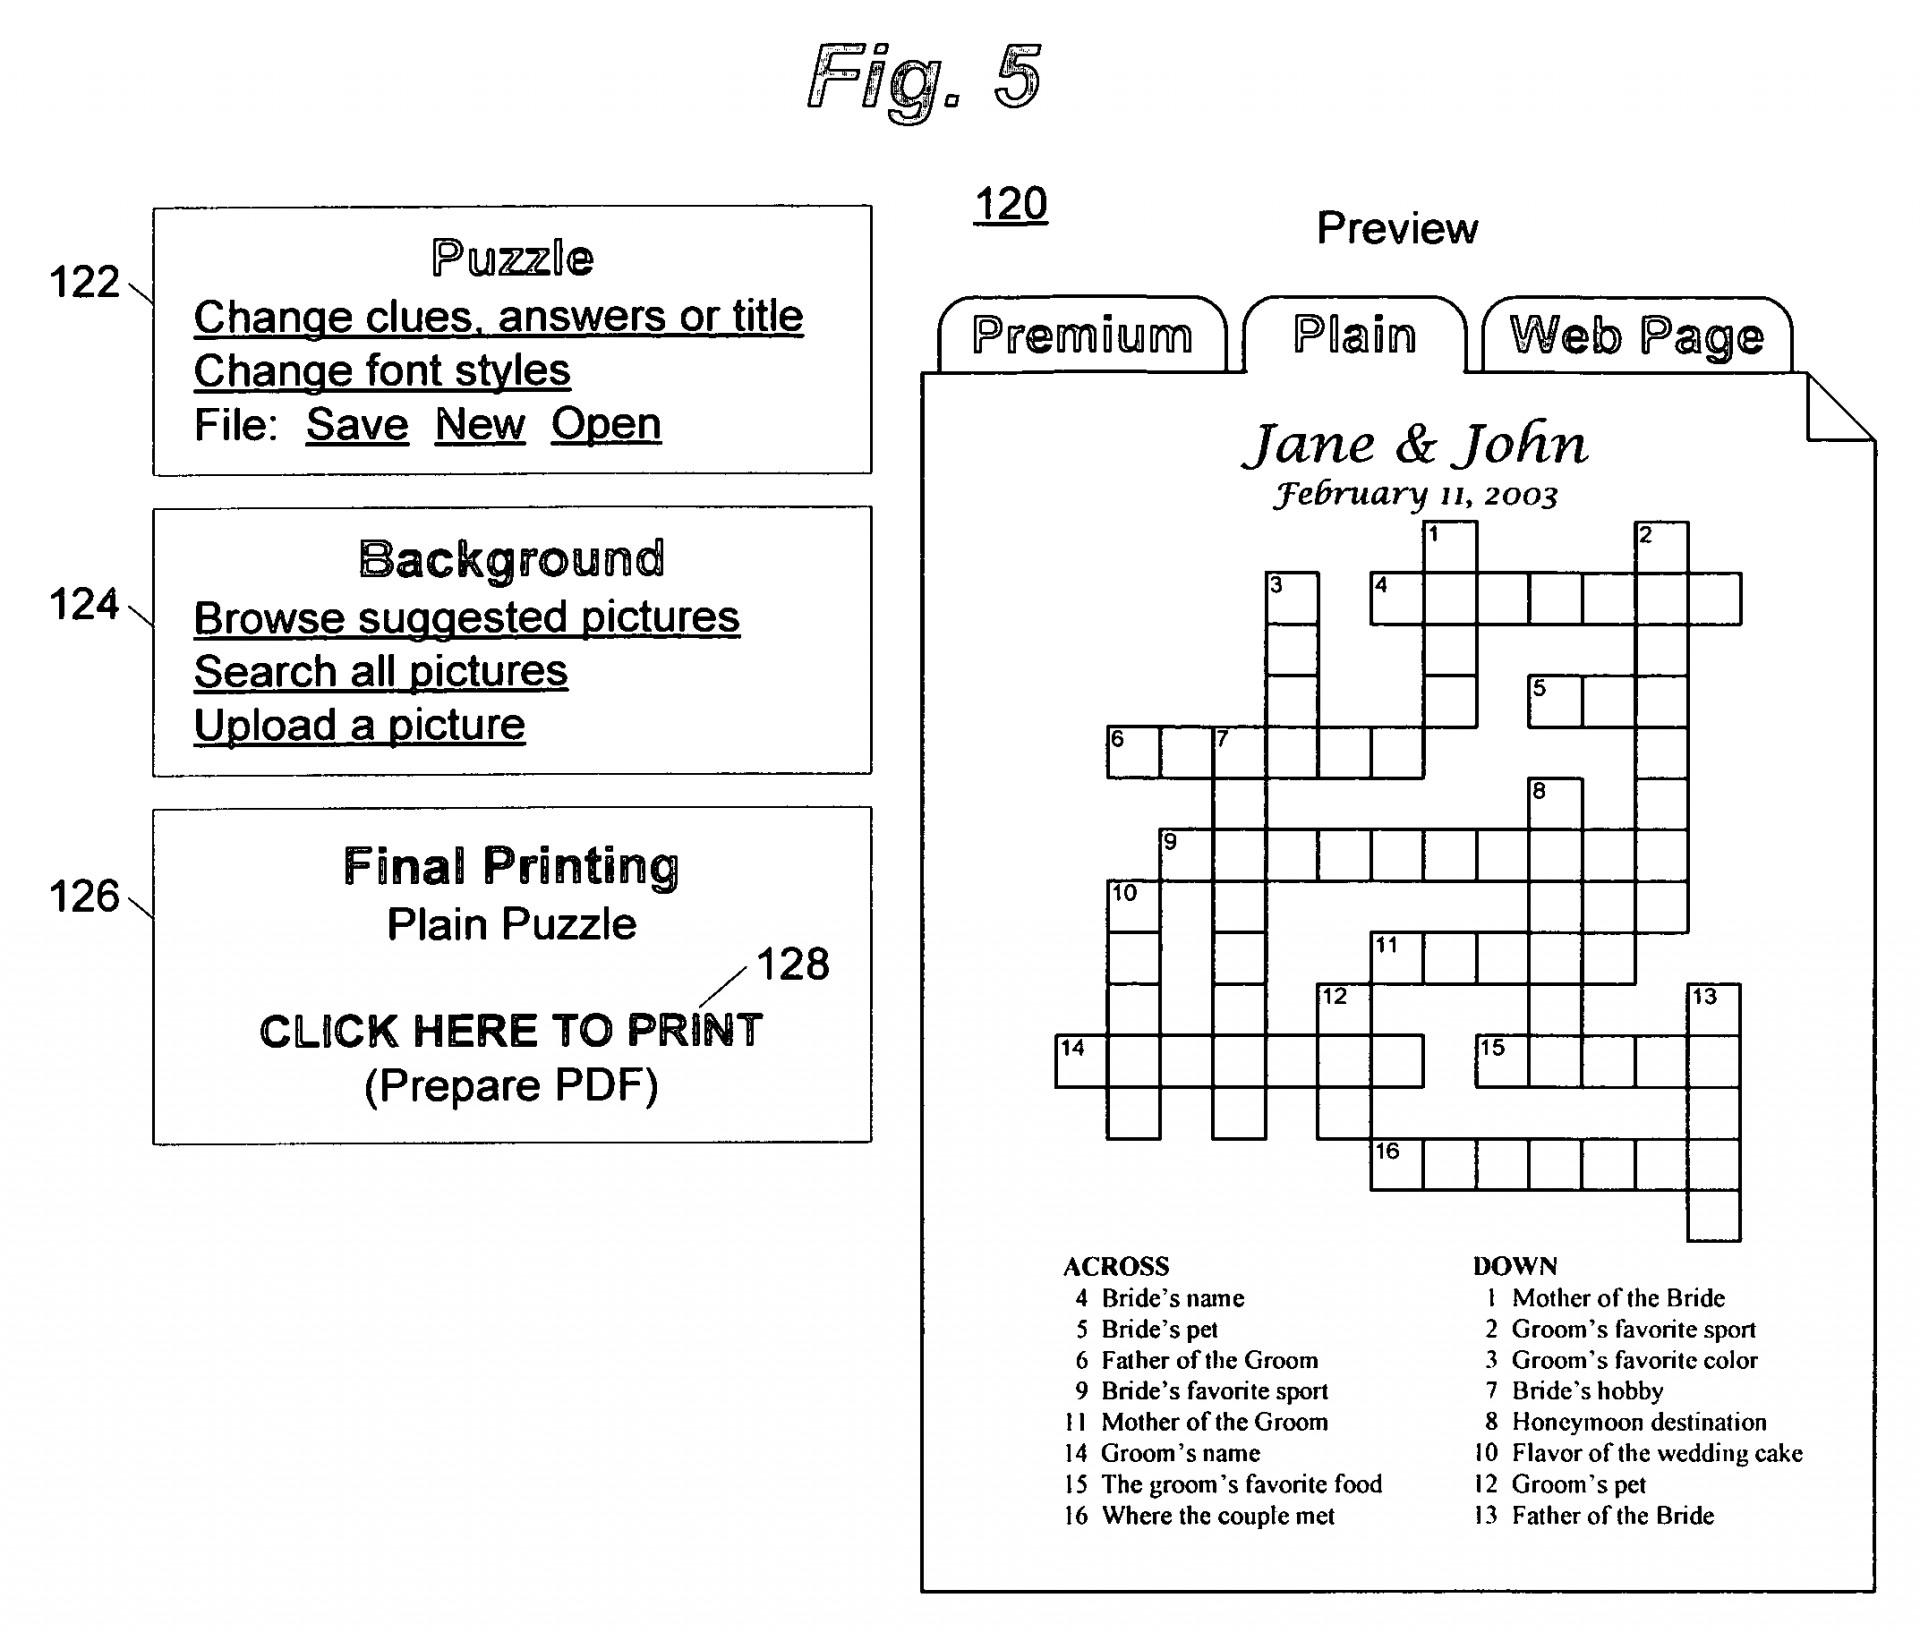 010 Essay Example Name In Essays Crossword Clue Us07210996 Excellent 1920